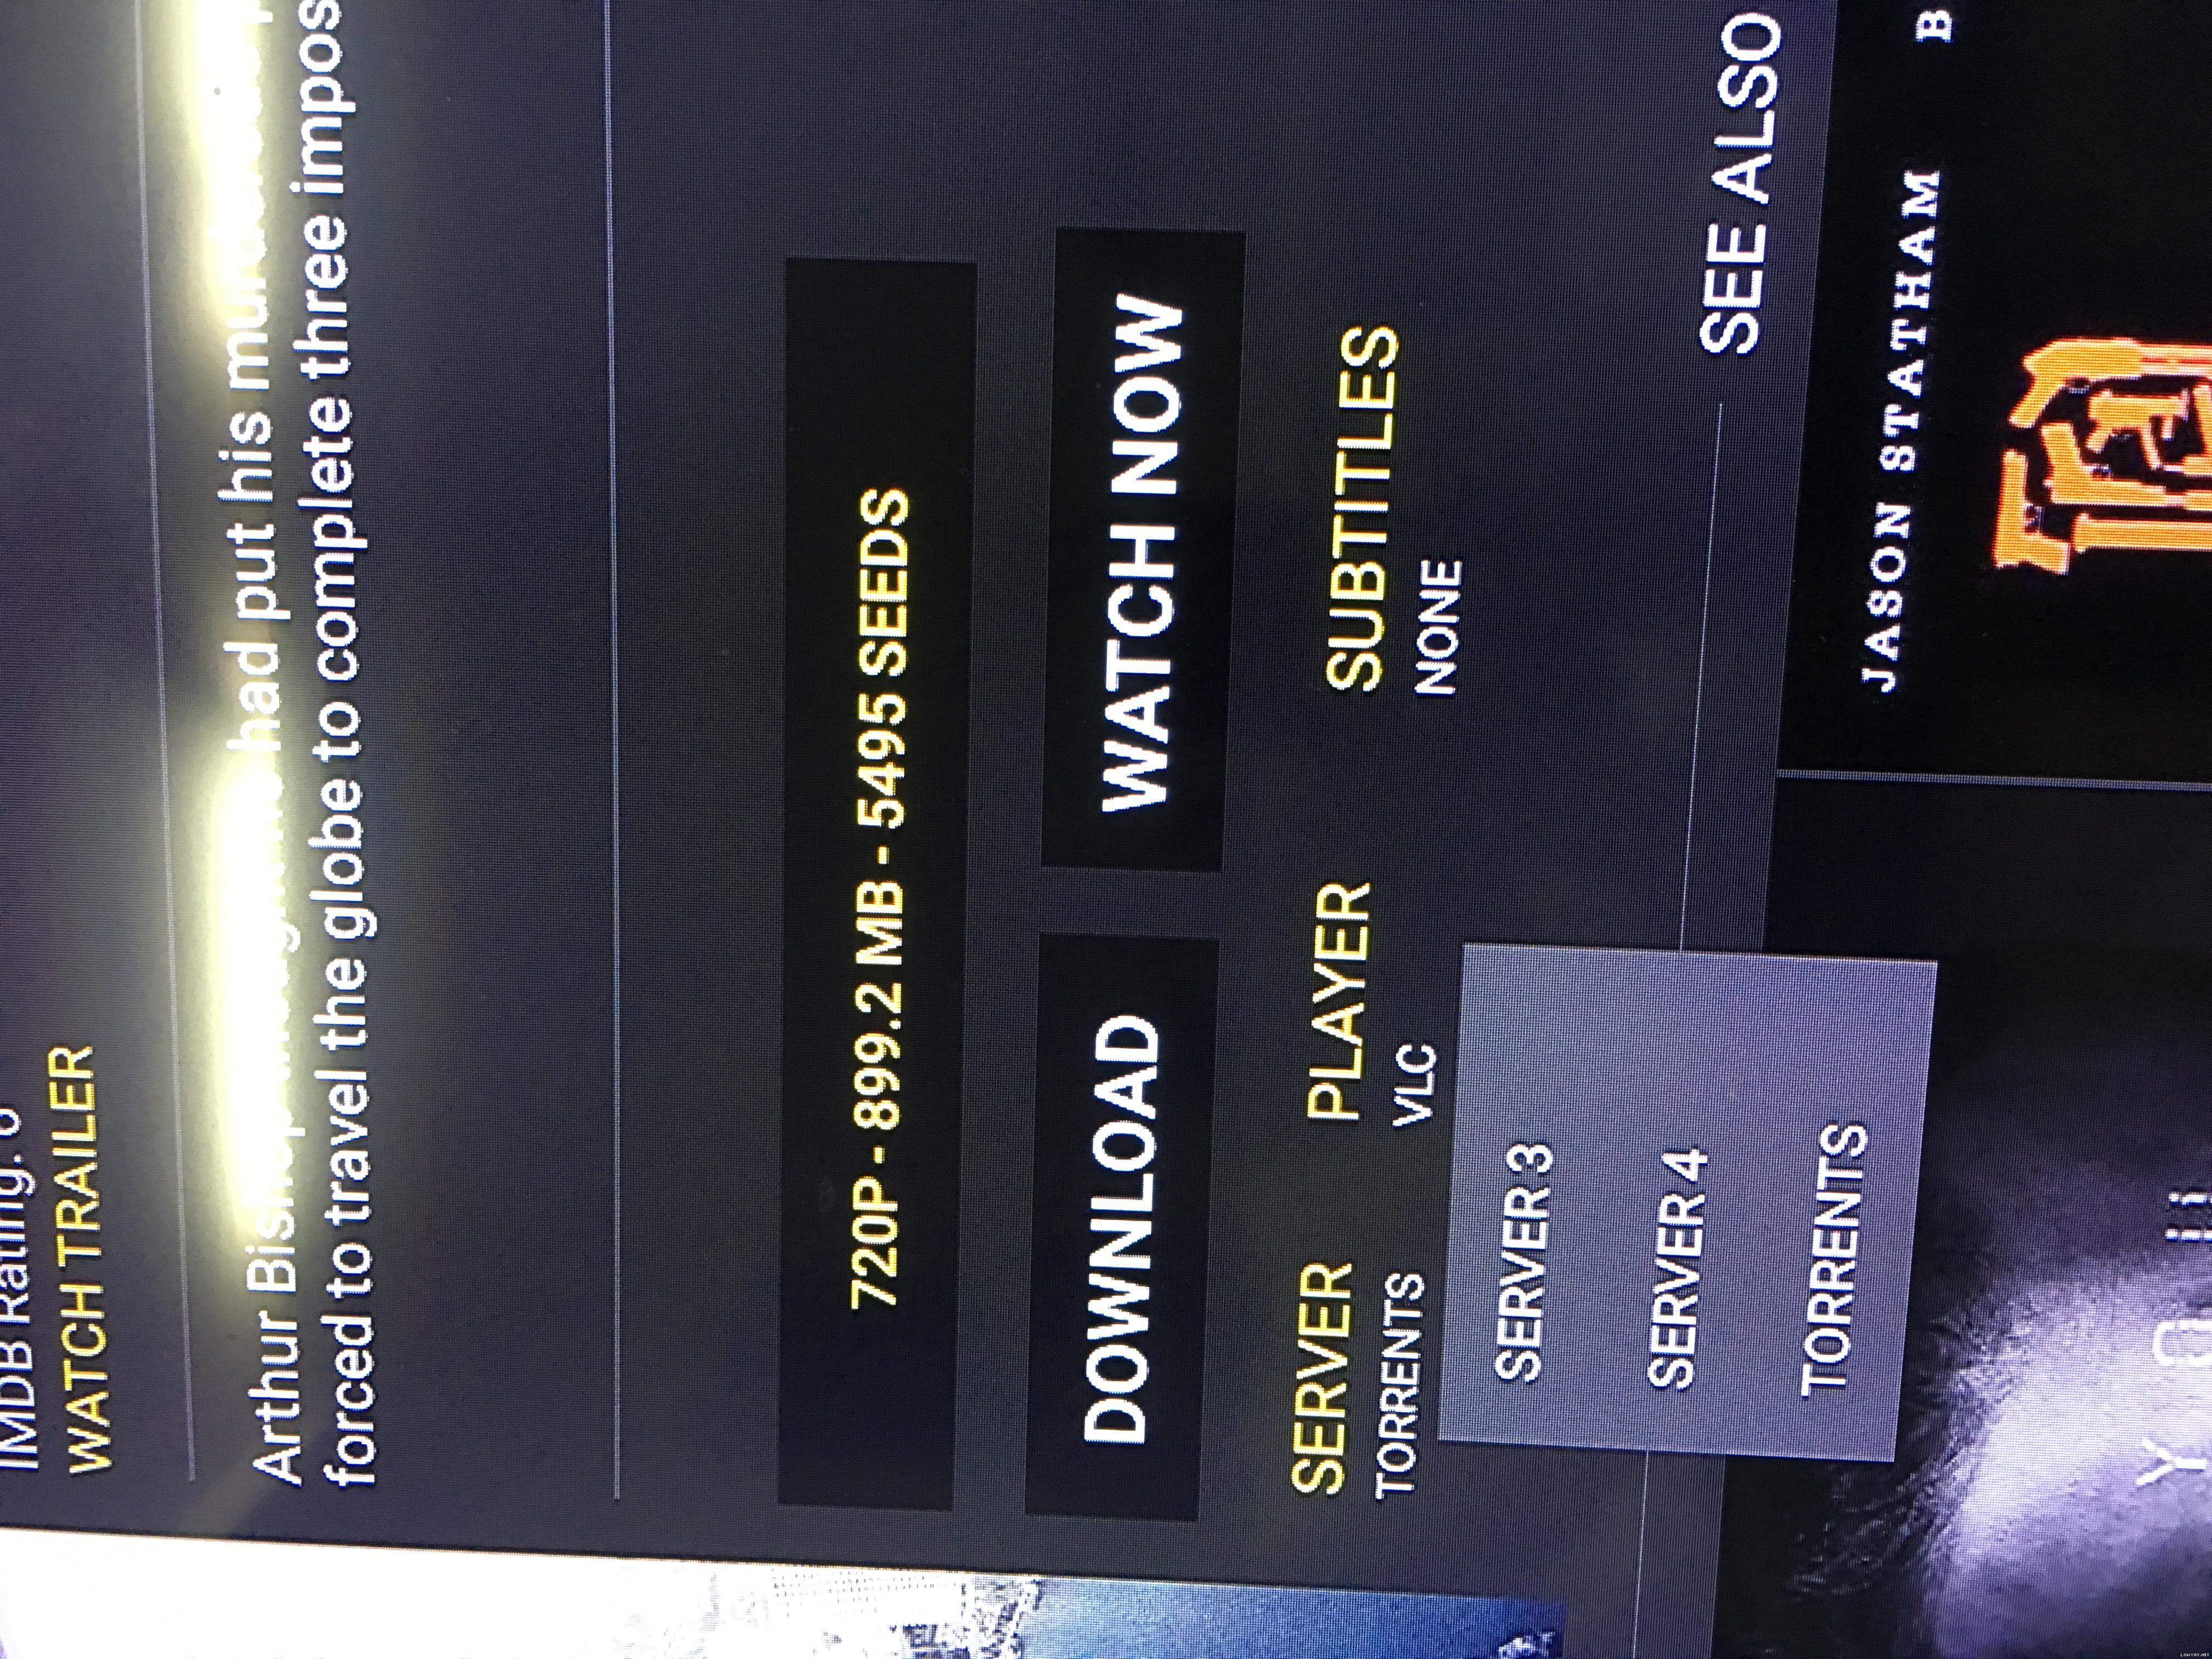 WTS] MINIX X8-H Plus 4K Android Media Player